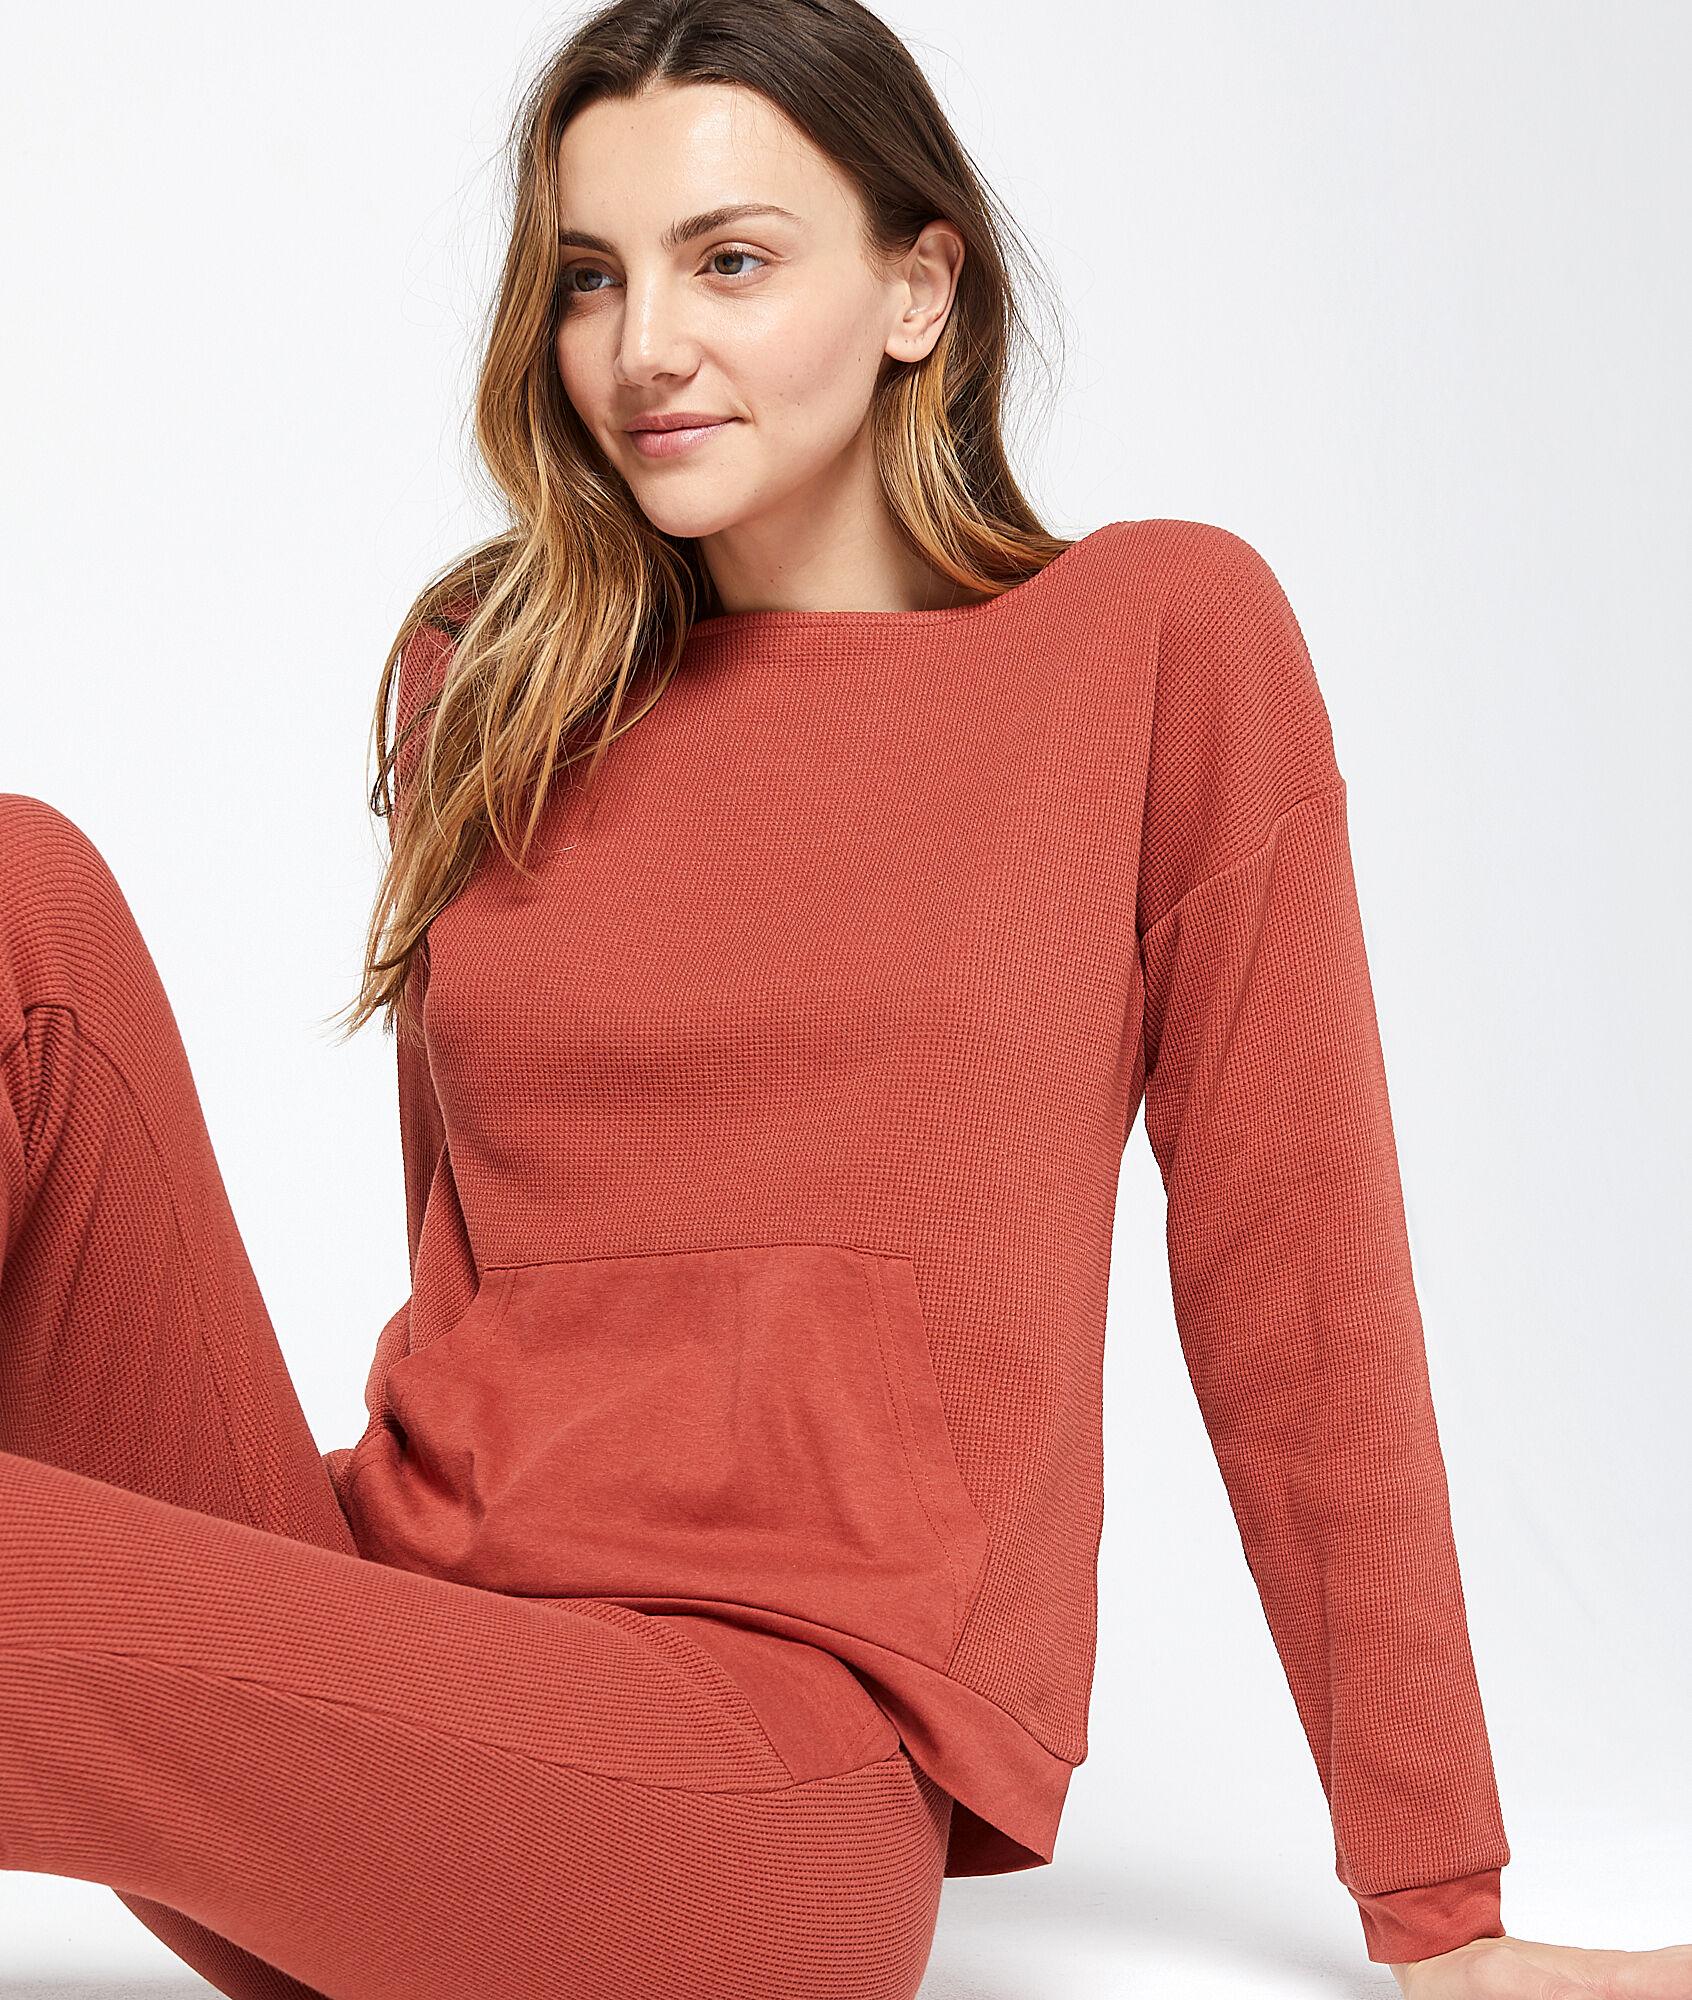 JAVOTTE Bluza z kieszenią typu kangur